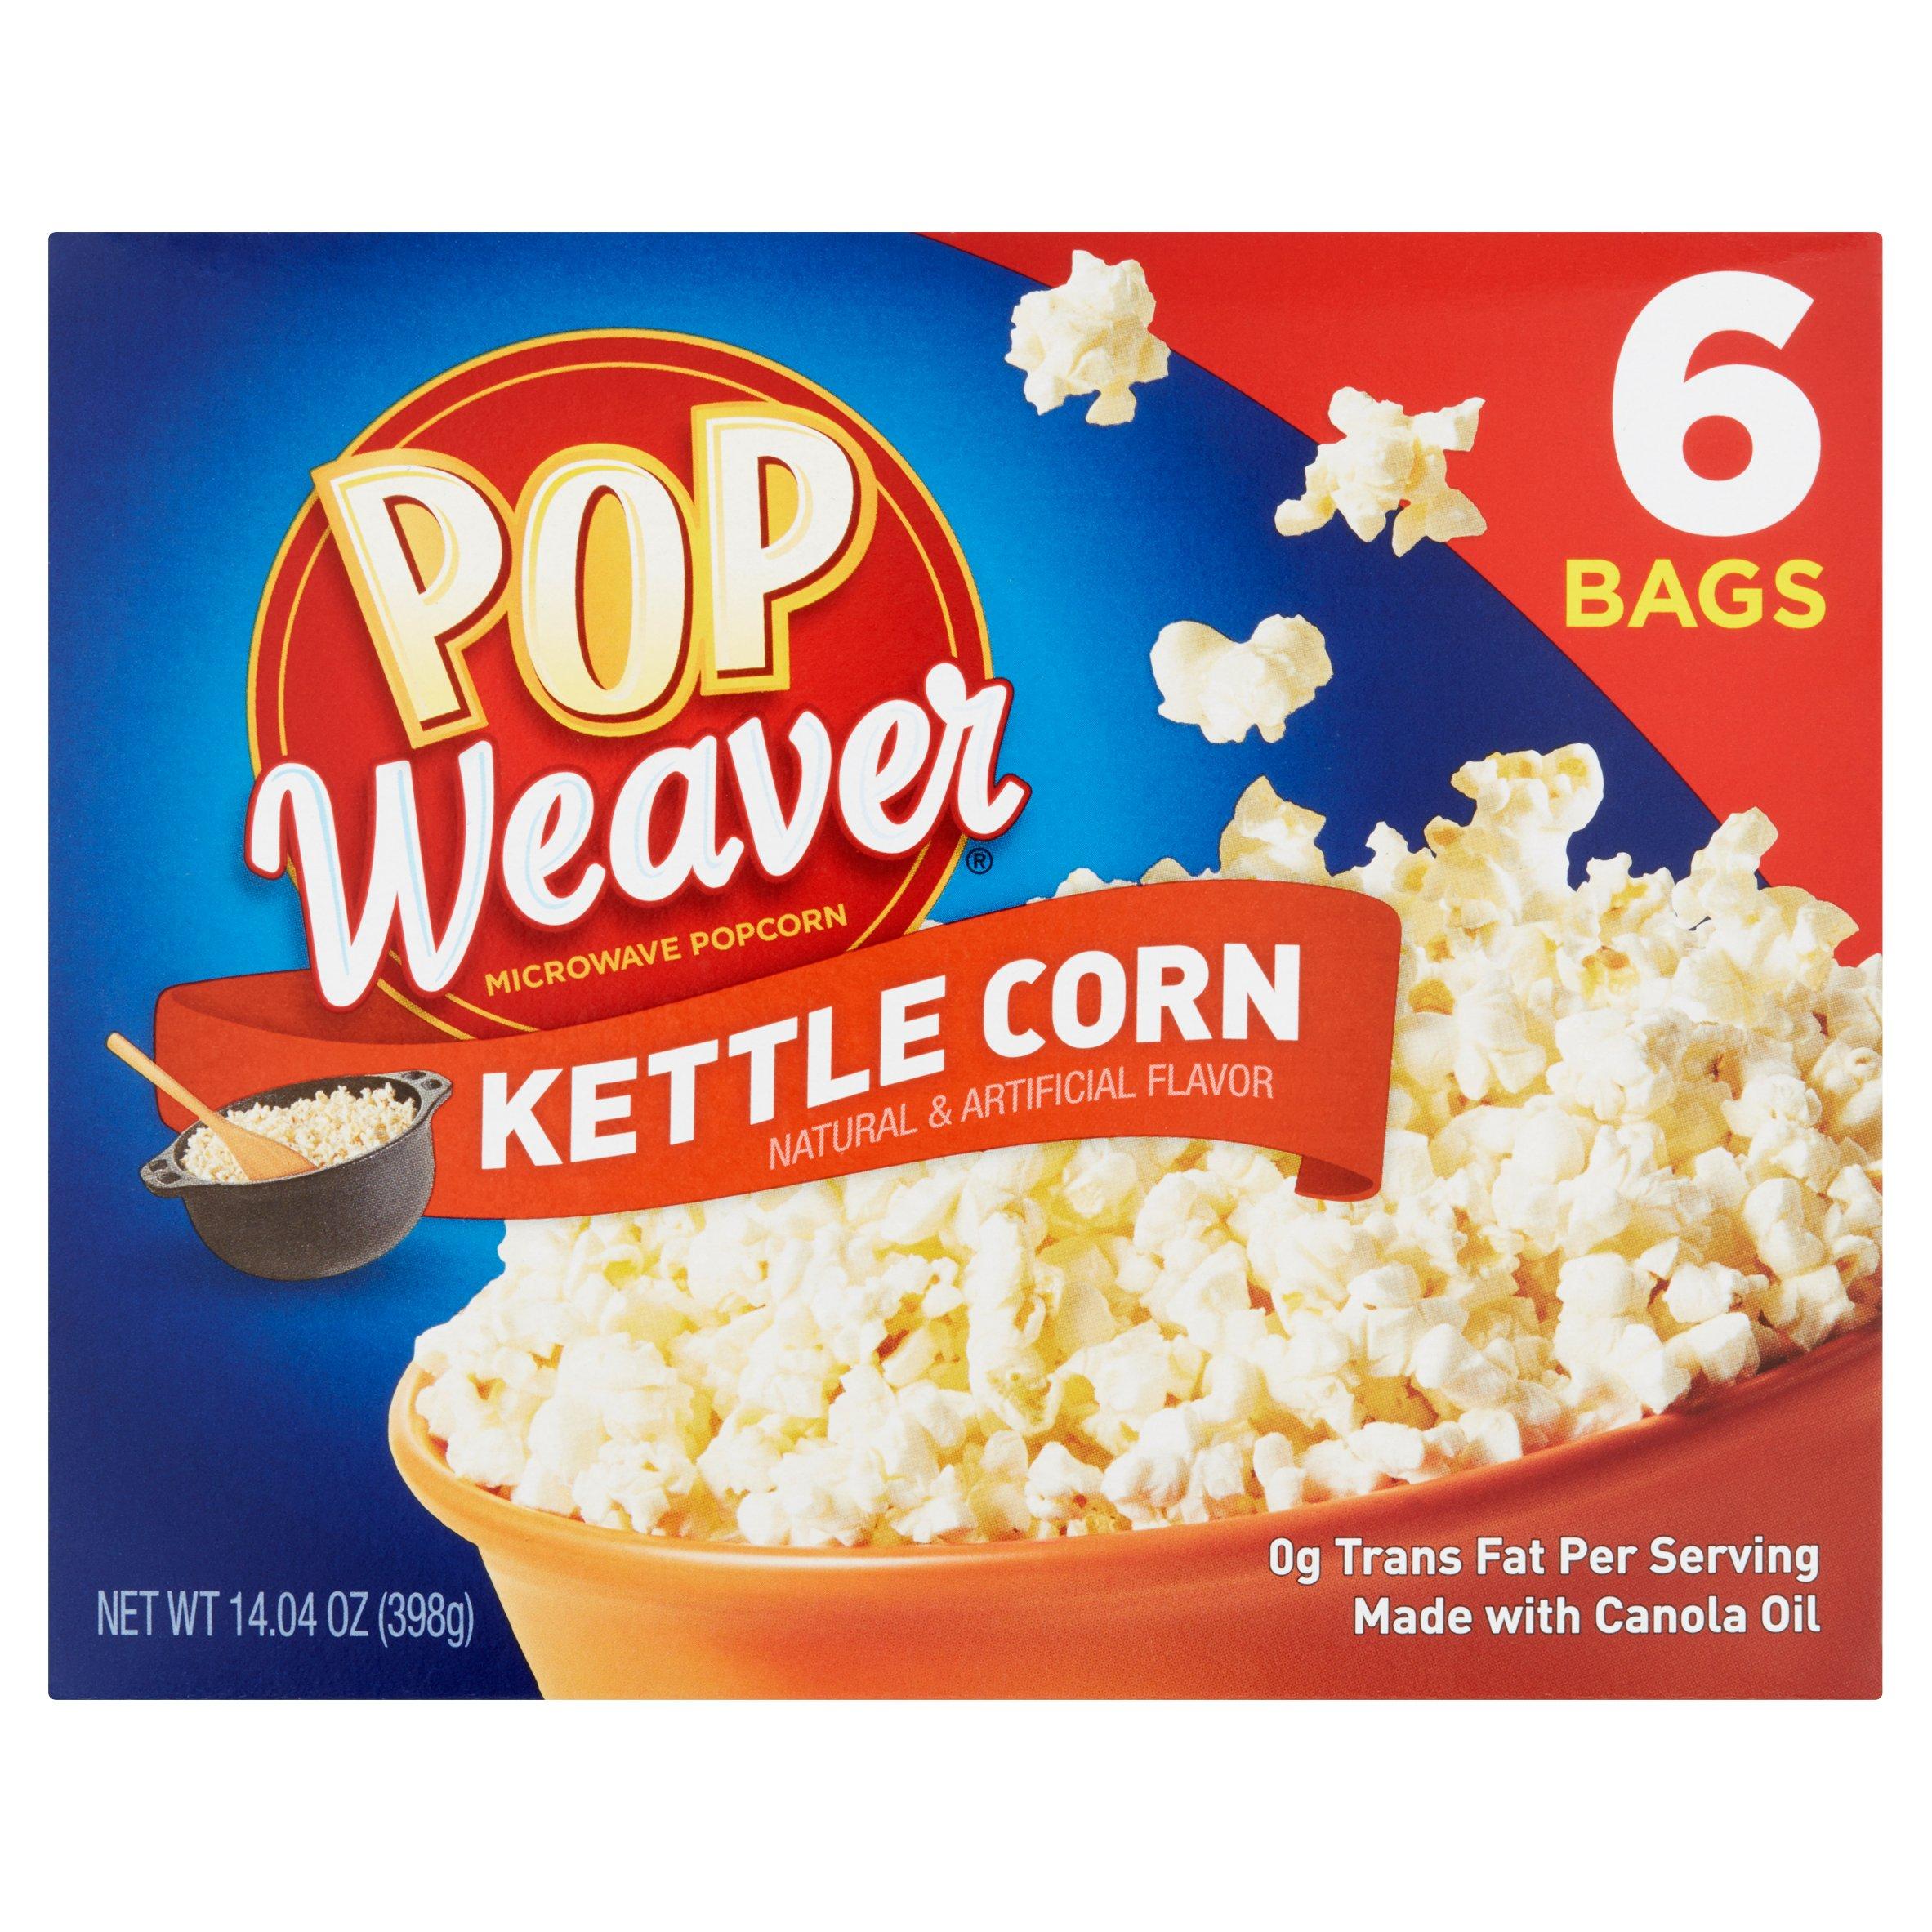 (4 Pack) Pop Weaver Kettle Corn Microwave Popcorn, 6 count, 14.04 oz